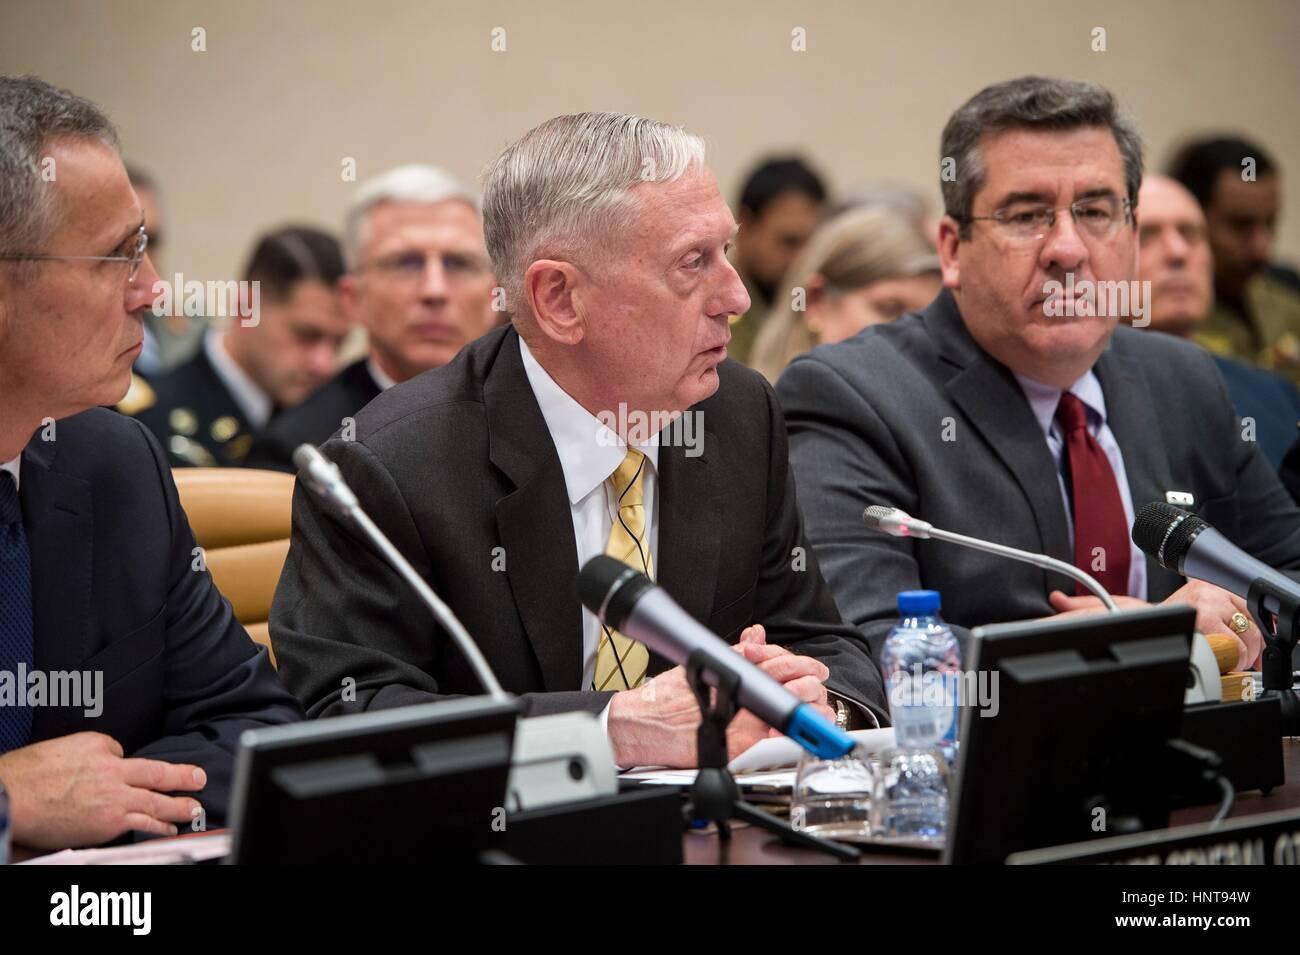 Brussels, Belgium. 16th February 2017. U.S. Secretary of Defense Jim Mattis speaks during a Global Coalition to Stock Photo